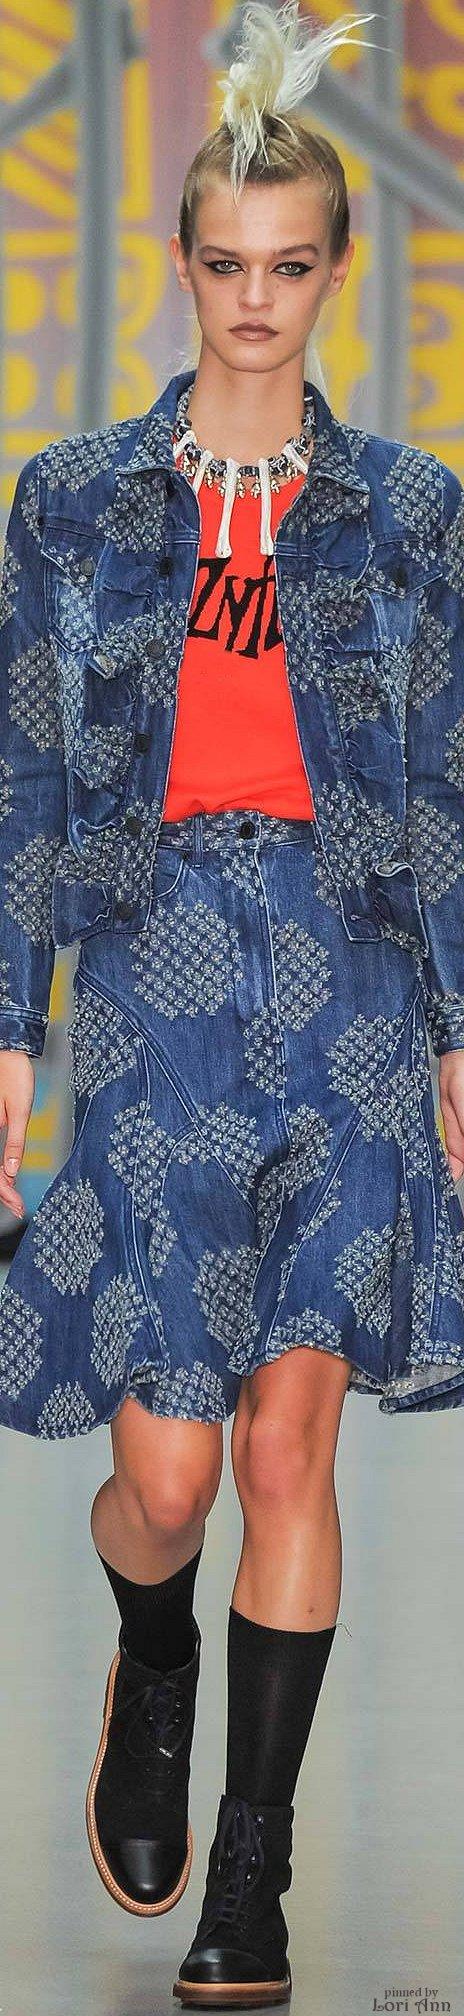 Sibling Spring 2015 Menswear Fashion, Menswear women